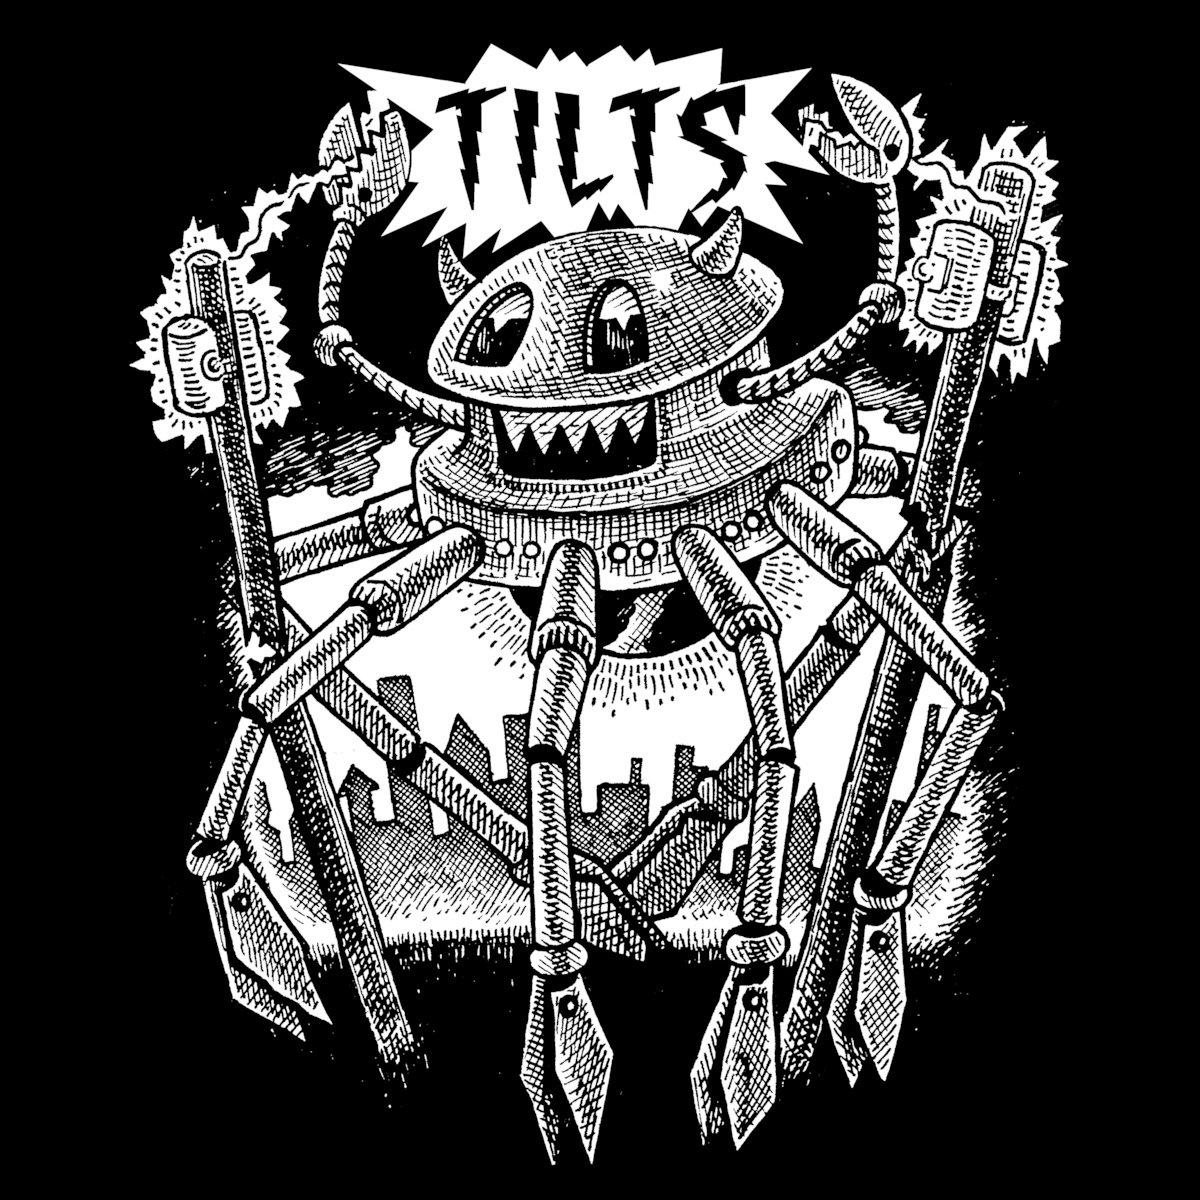 Tilts - S/T 12